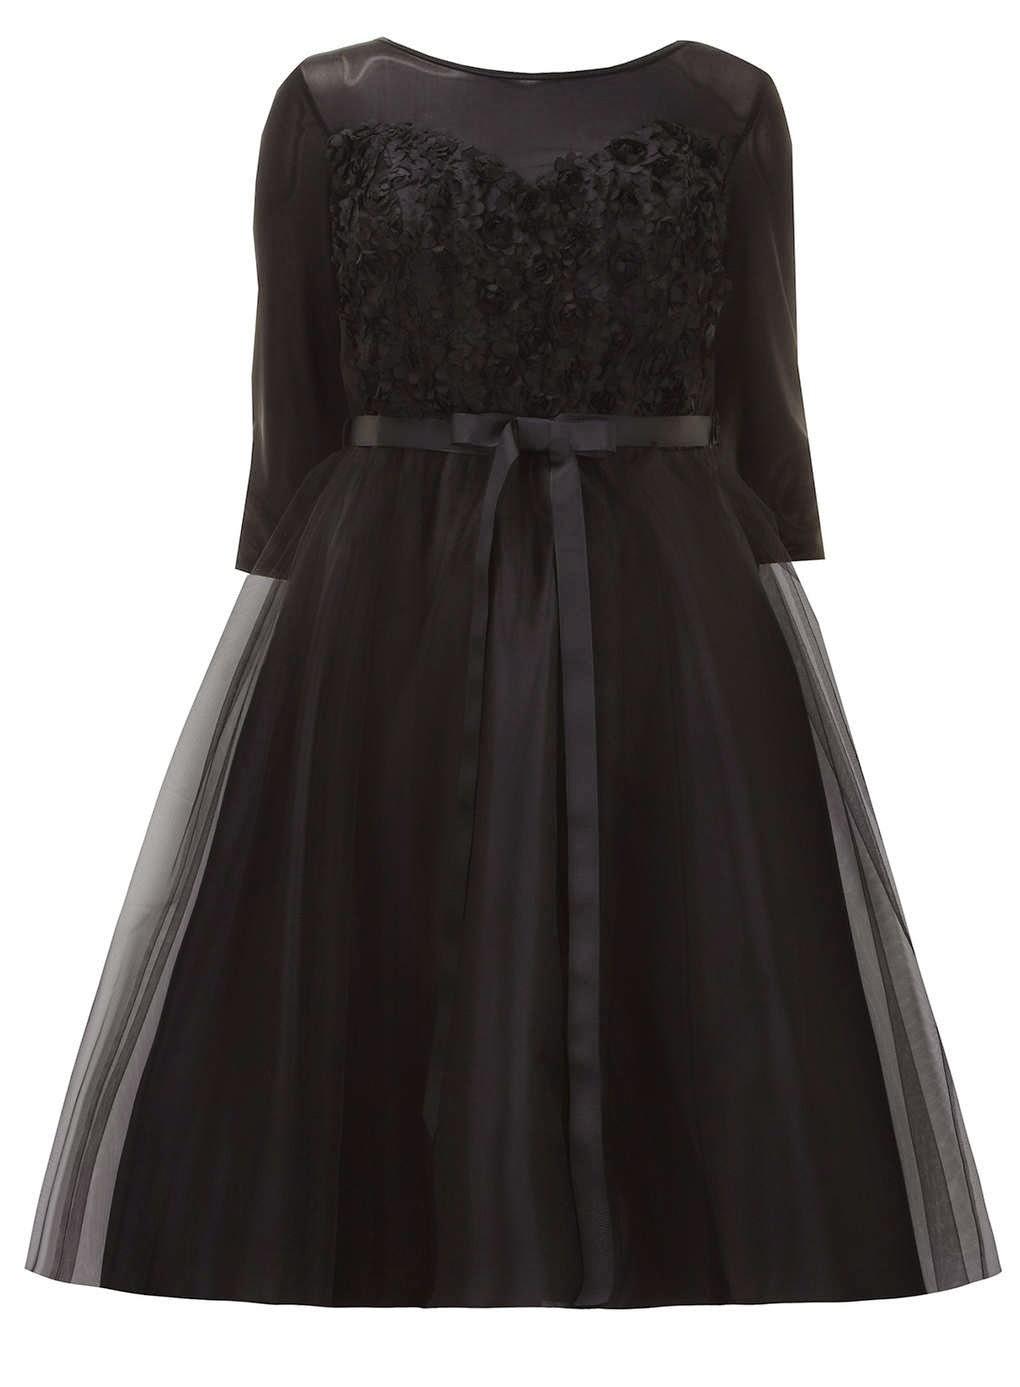 Evans Scarlett & Jo Black 3D Textured Floral Prom Dress 16